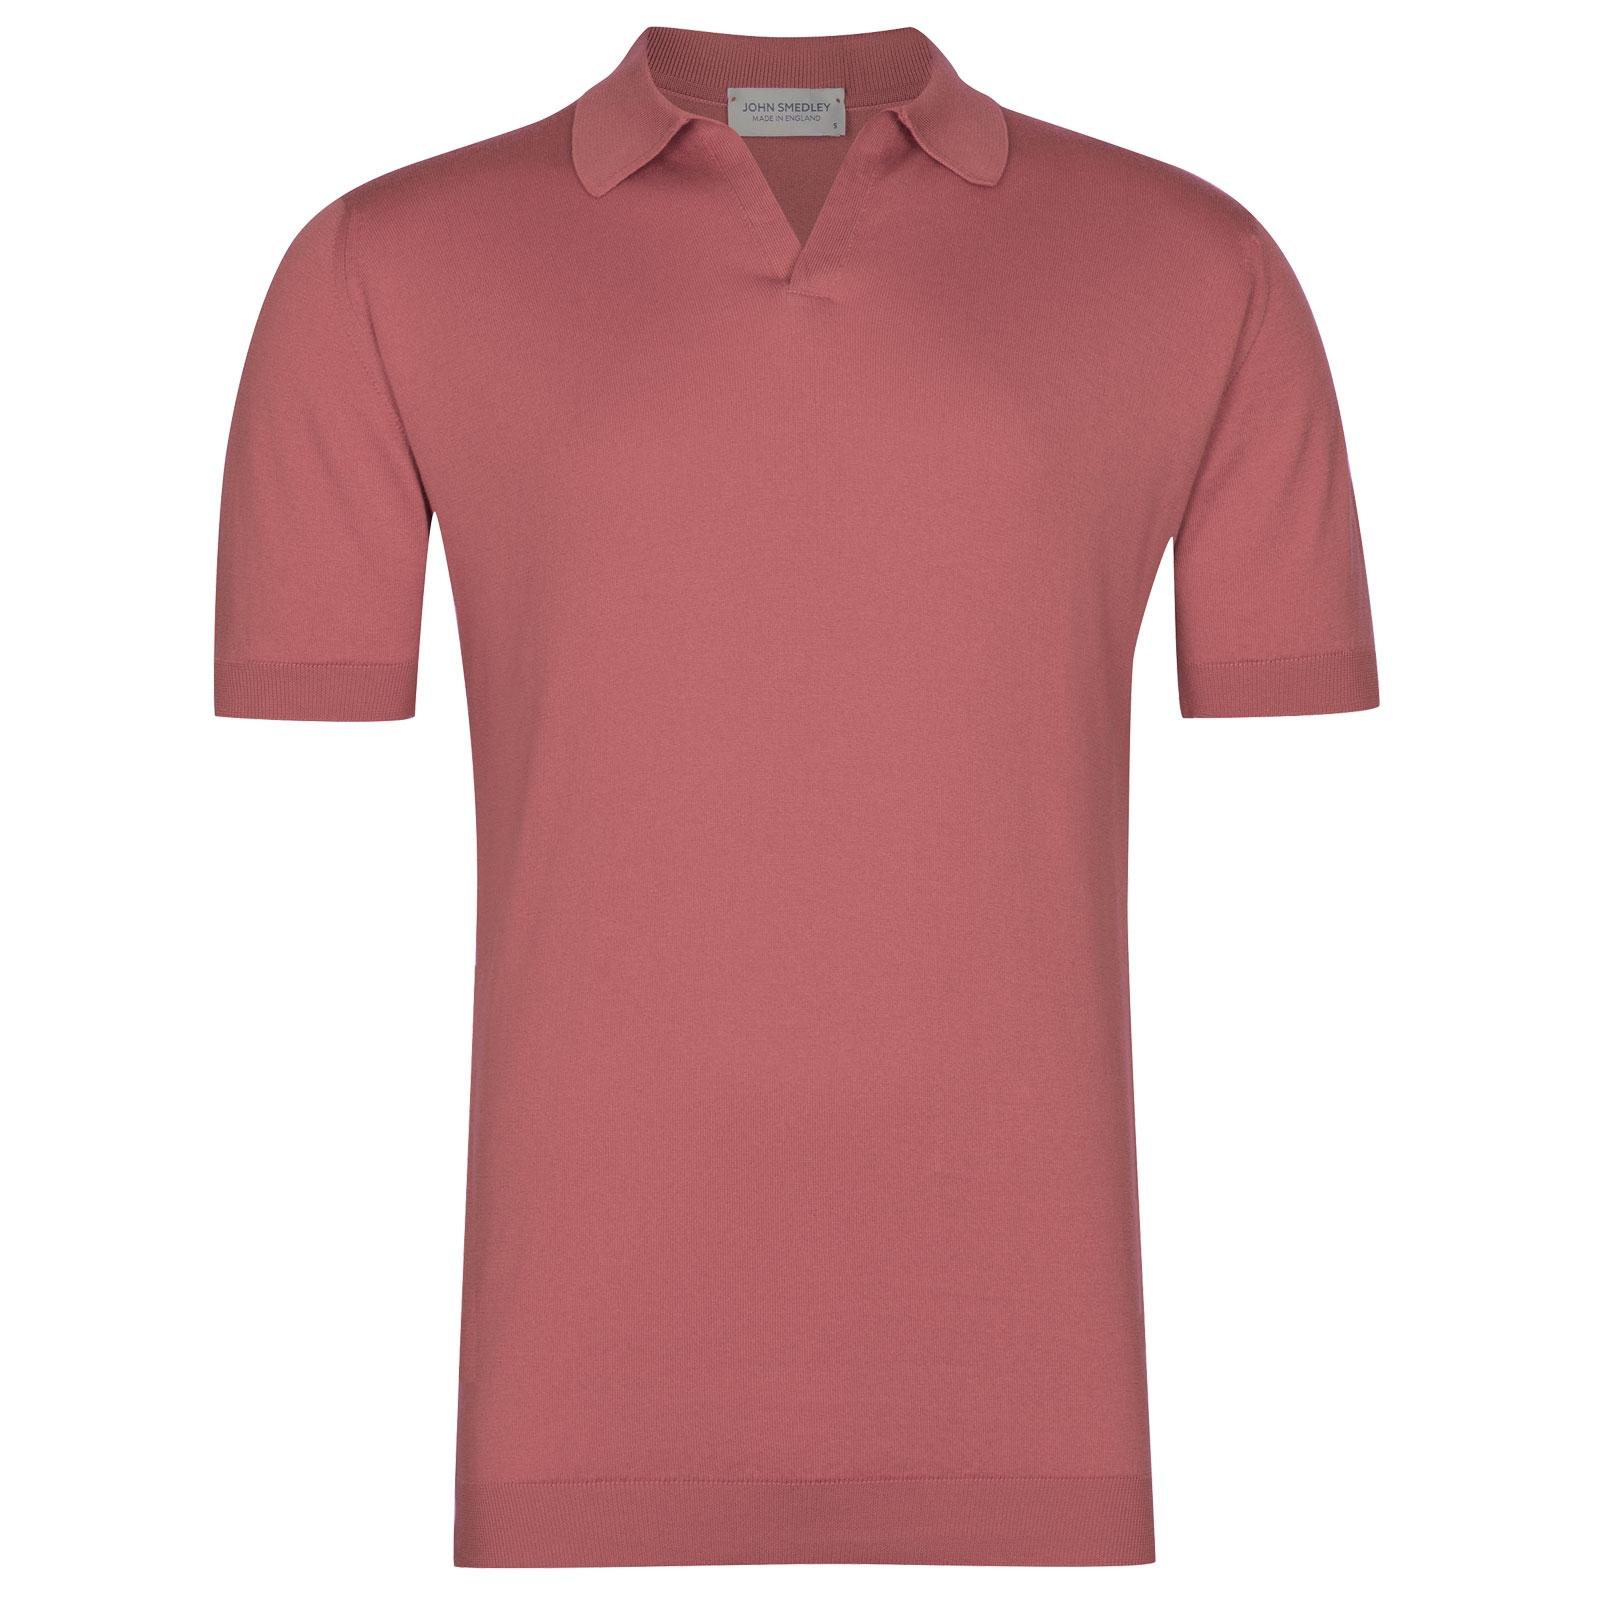 John Smedley Noah in Azalea Pink Shirt-XLG